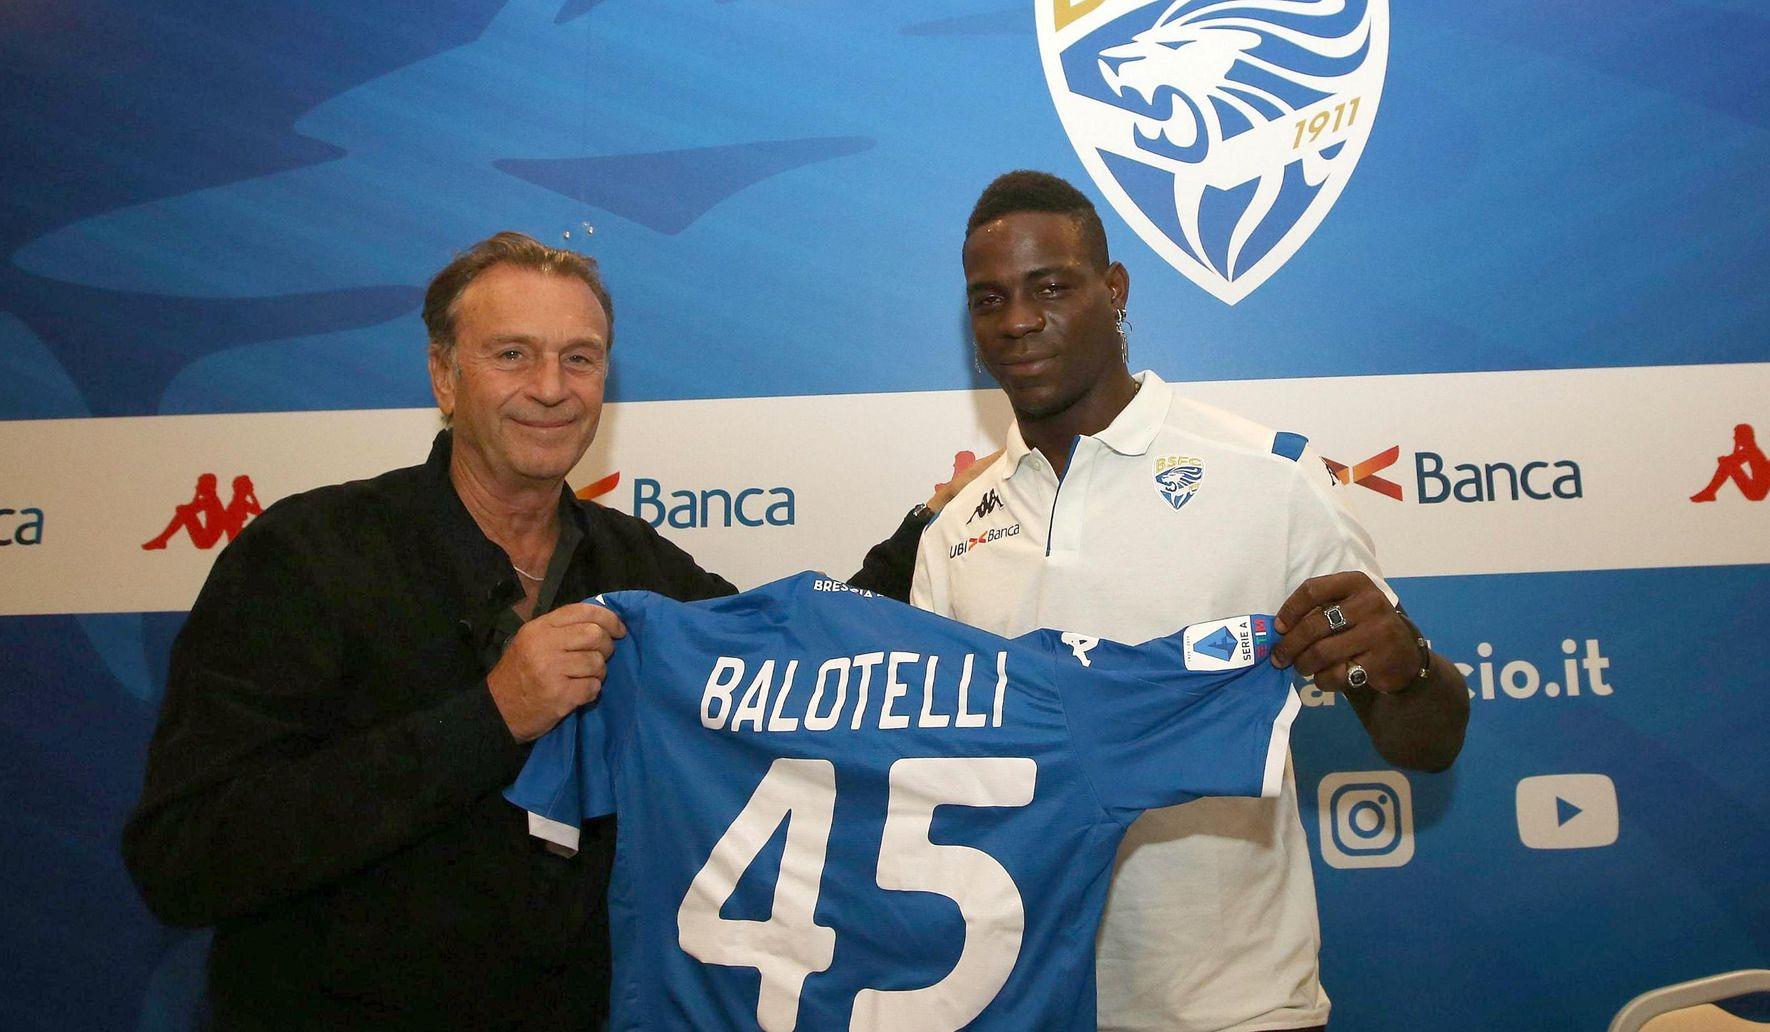 Italy_soccer_brescia_balotelli_03287_c0-180-2741-1778_s1770x1032